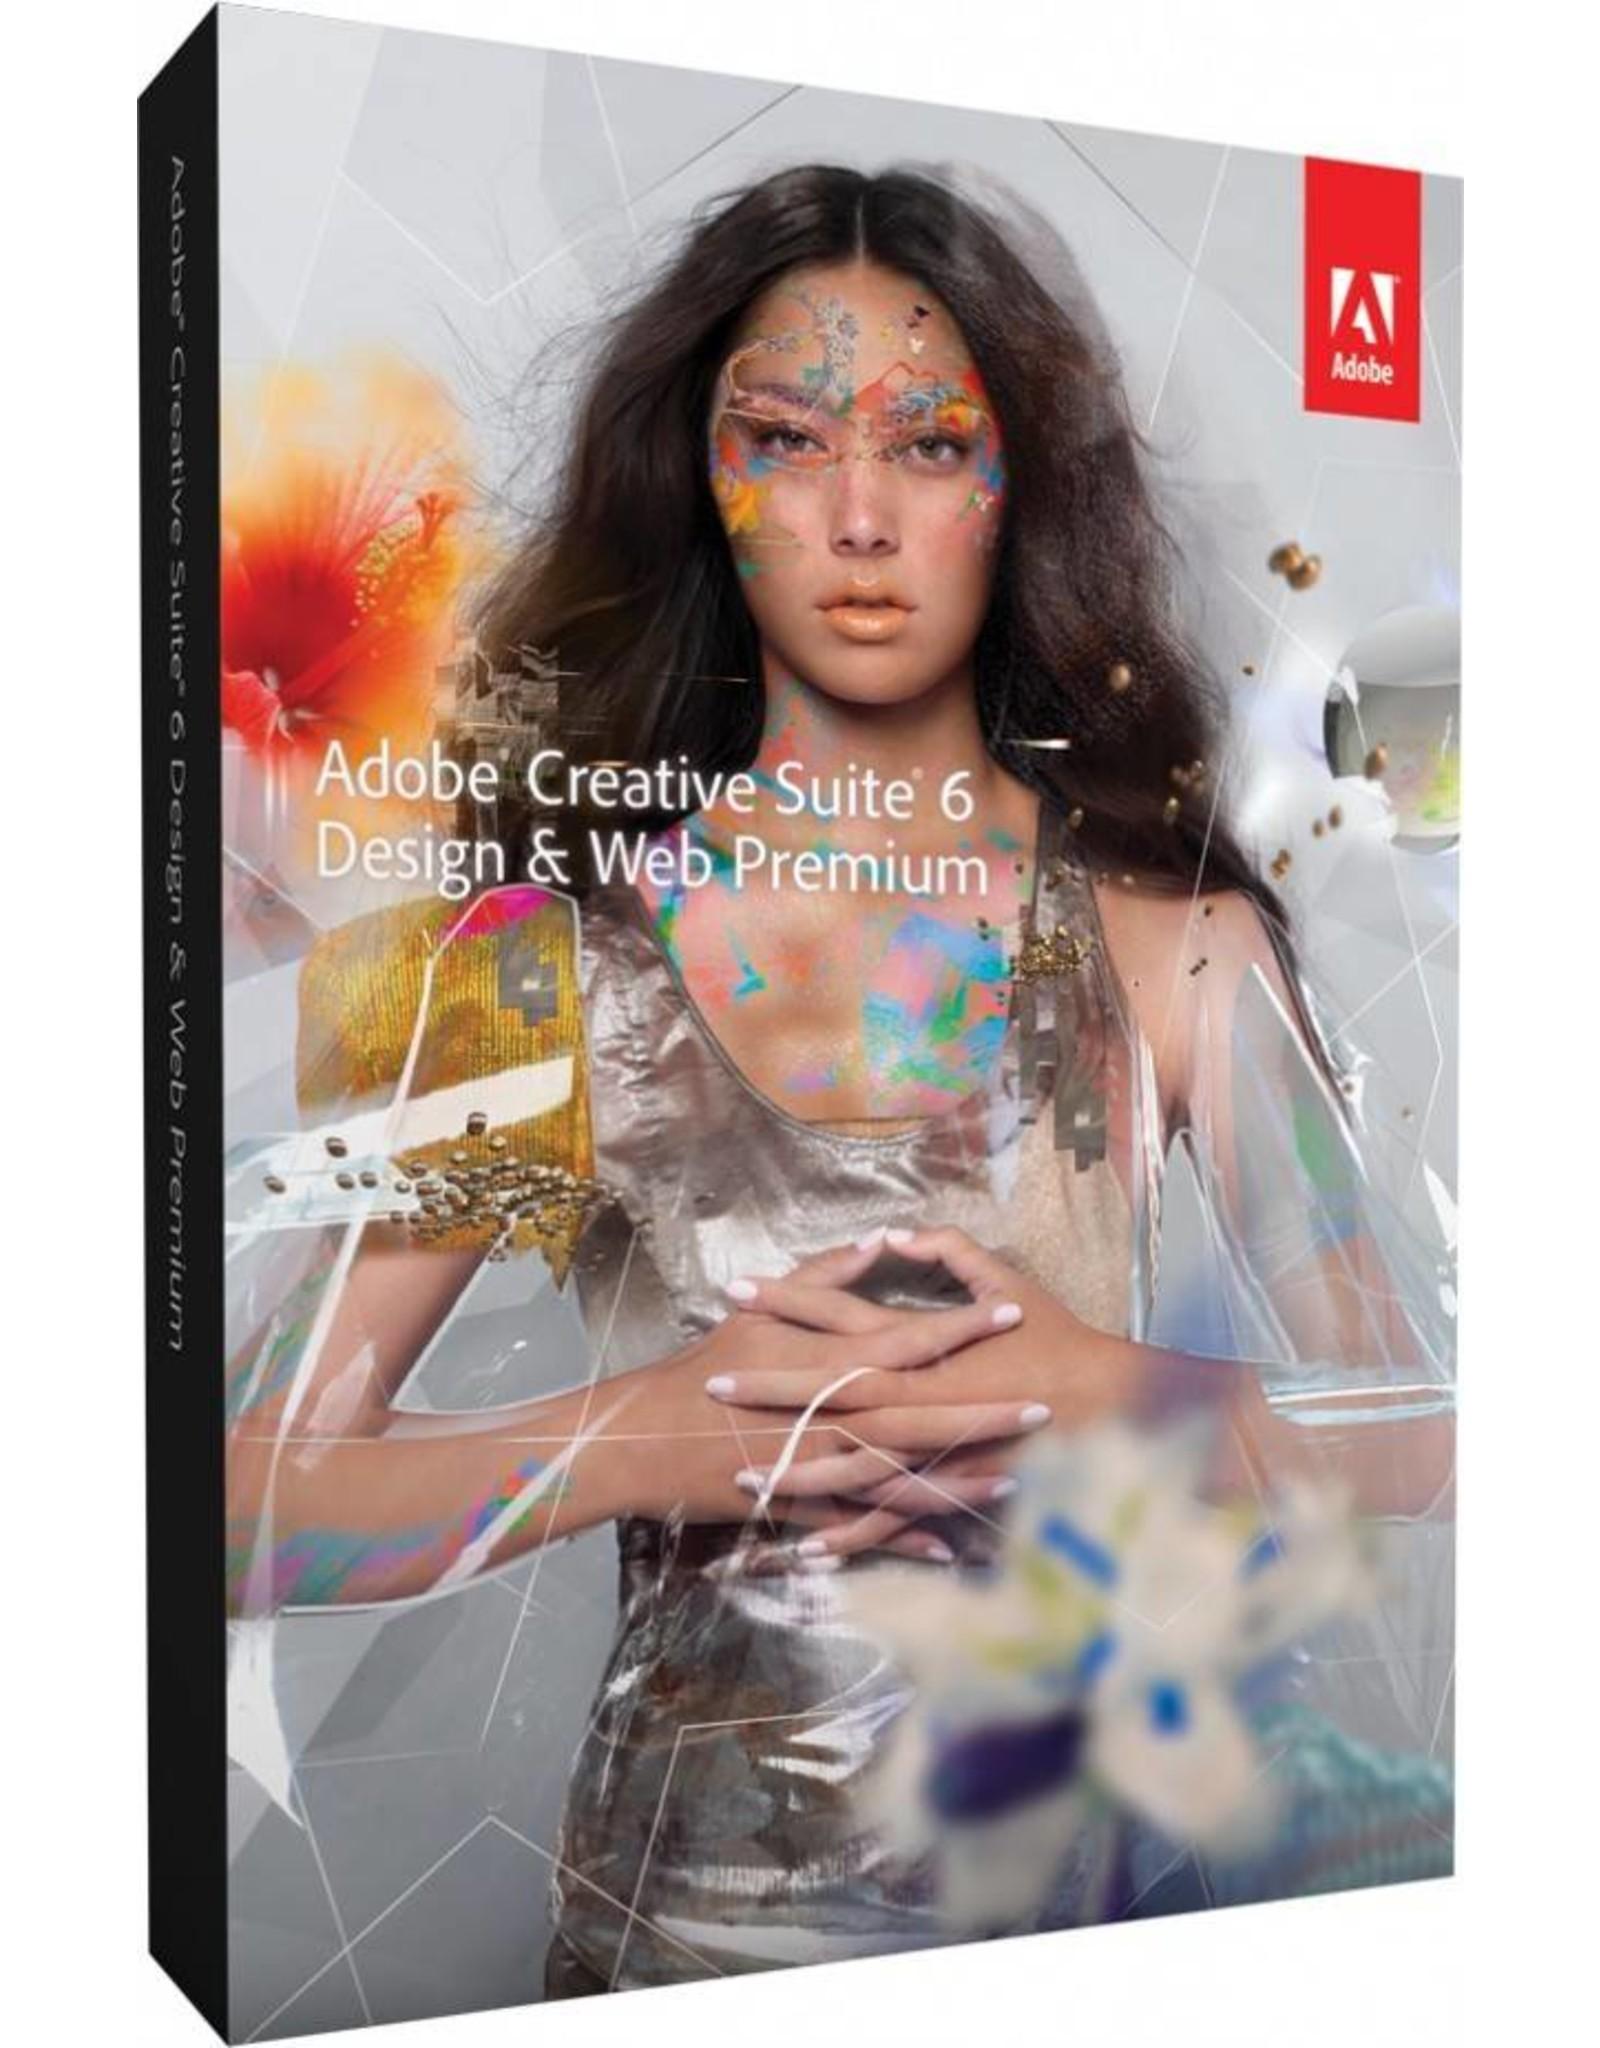 Adobe Adobe Creative Suite 6 Design & Web Premium MAC